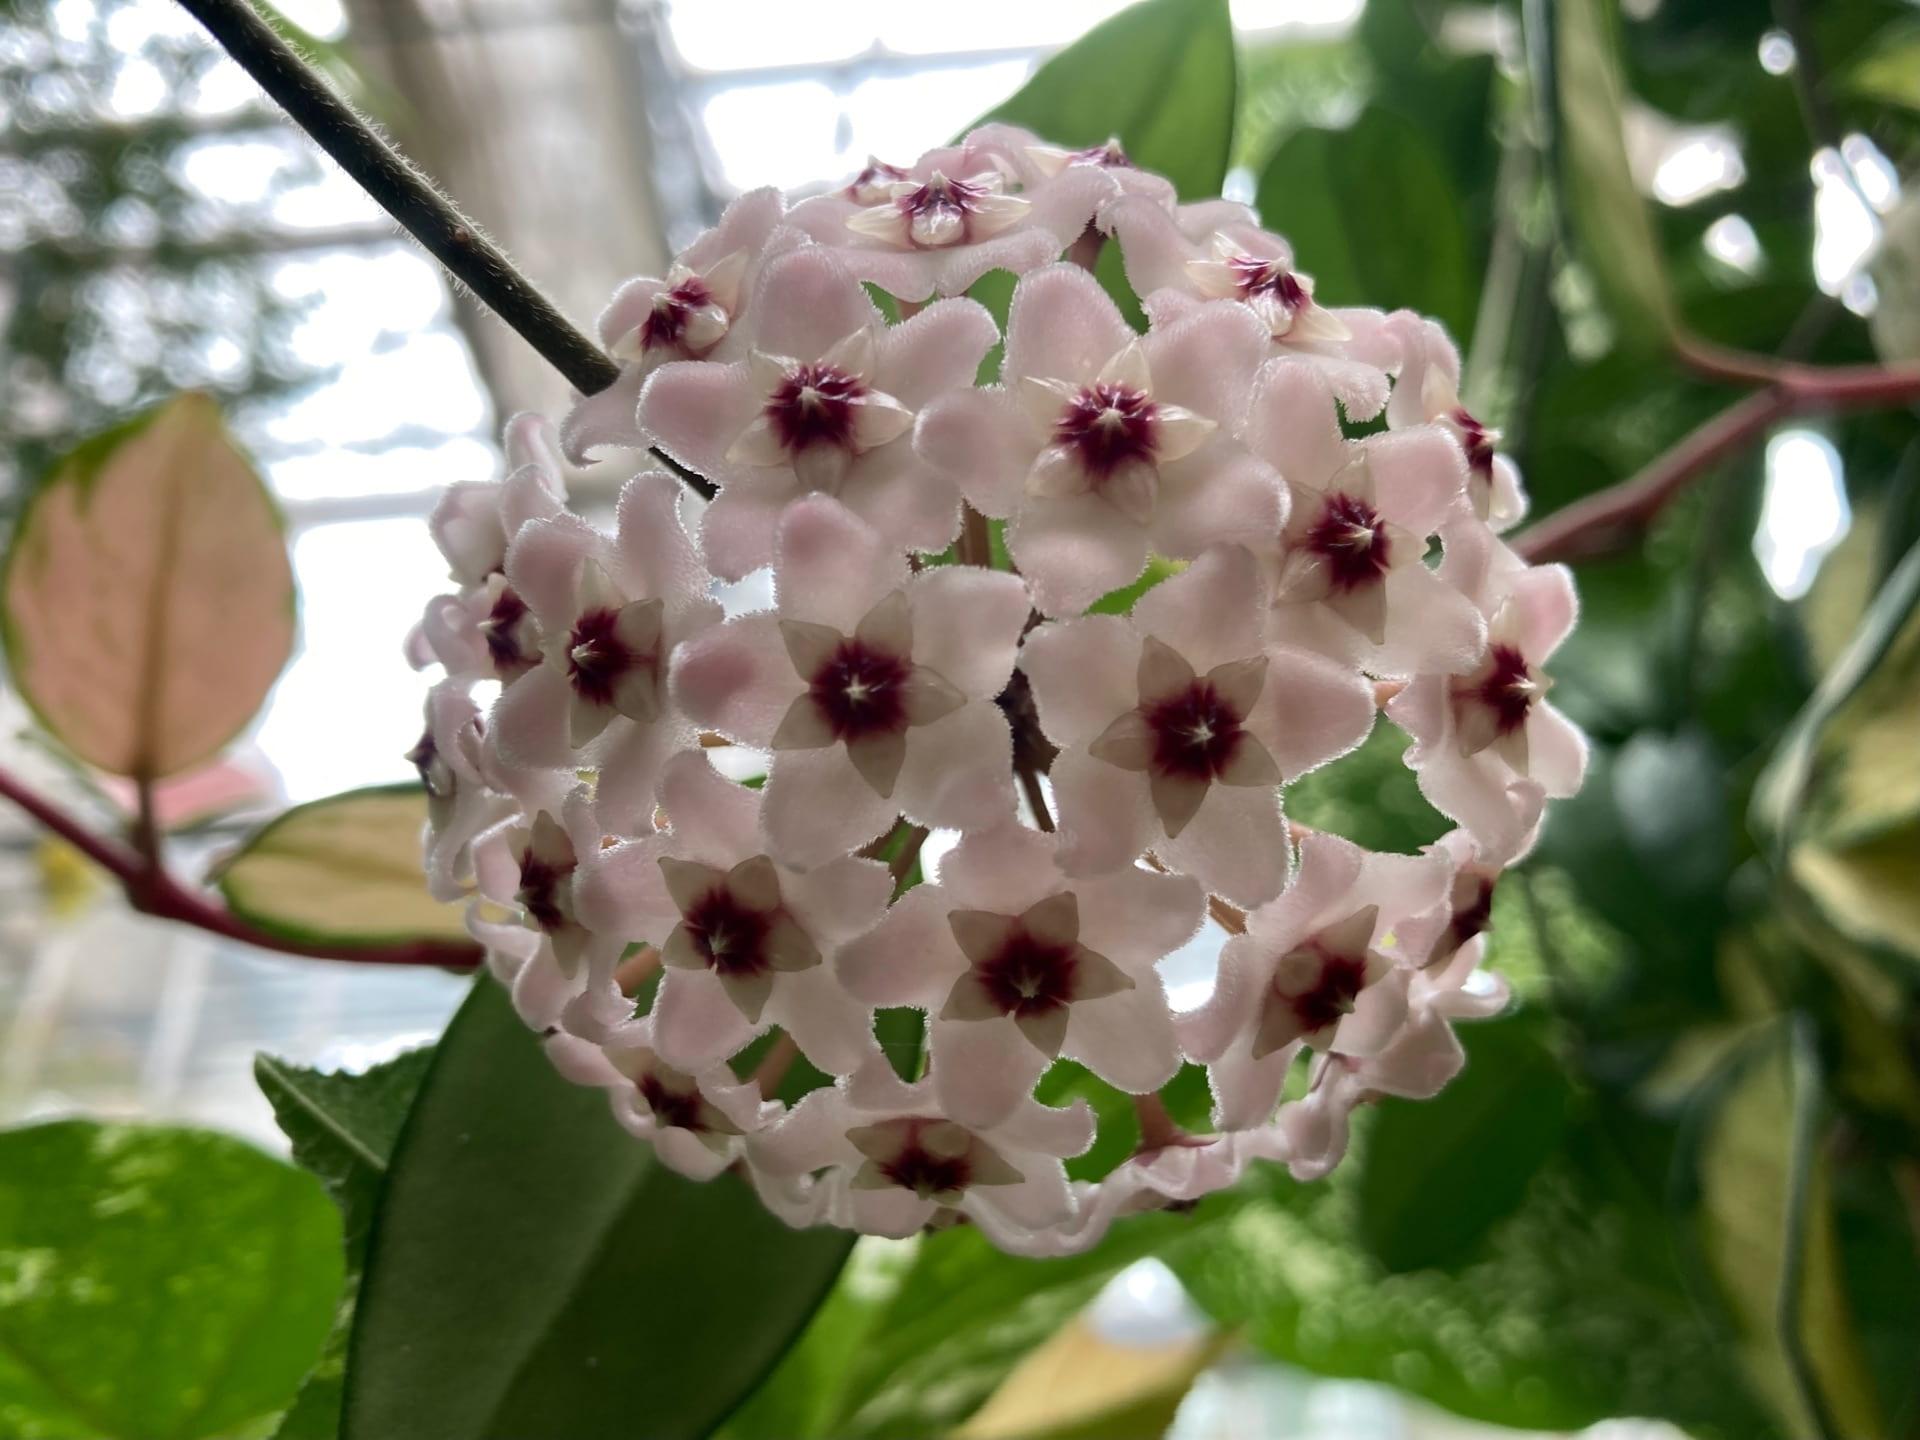 Looking up into the blooms of Hoya carnosa 'Variegata'.